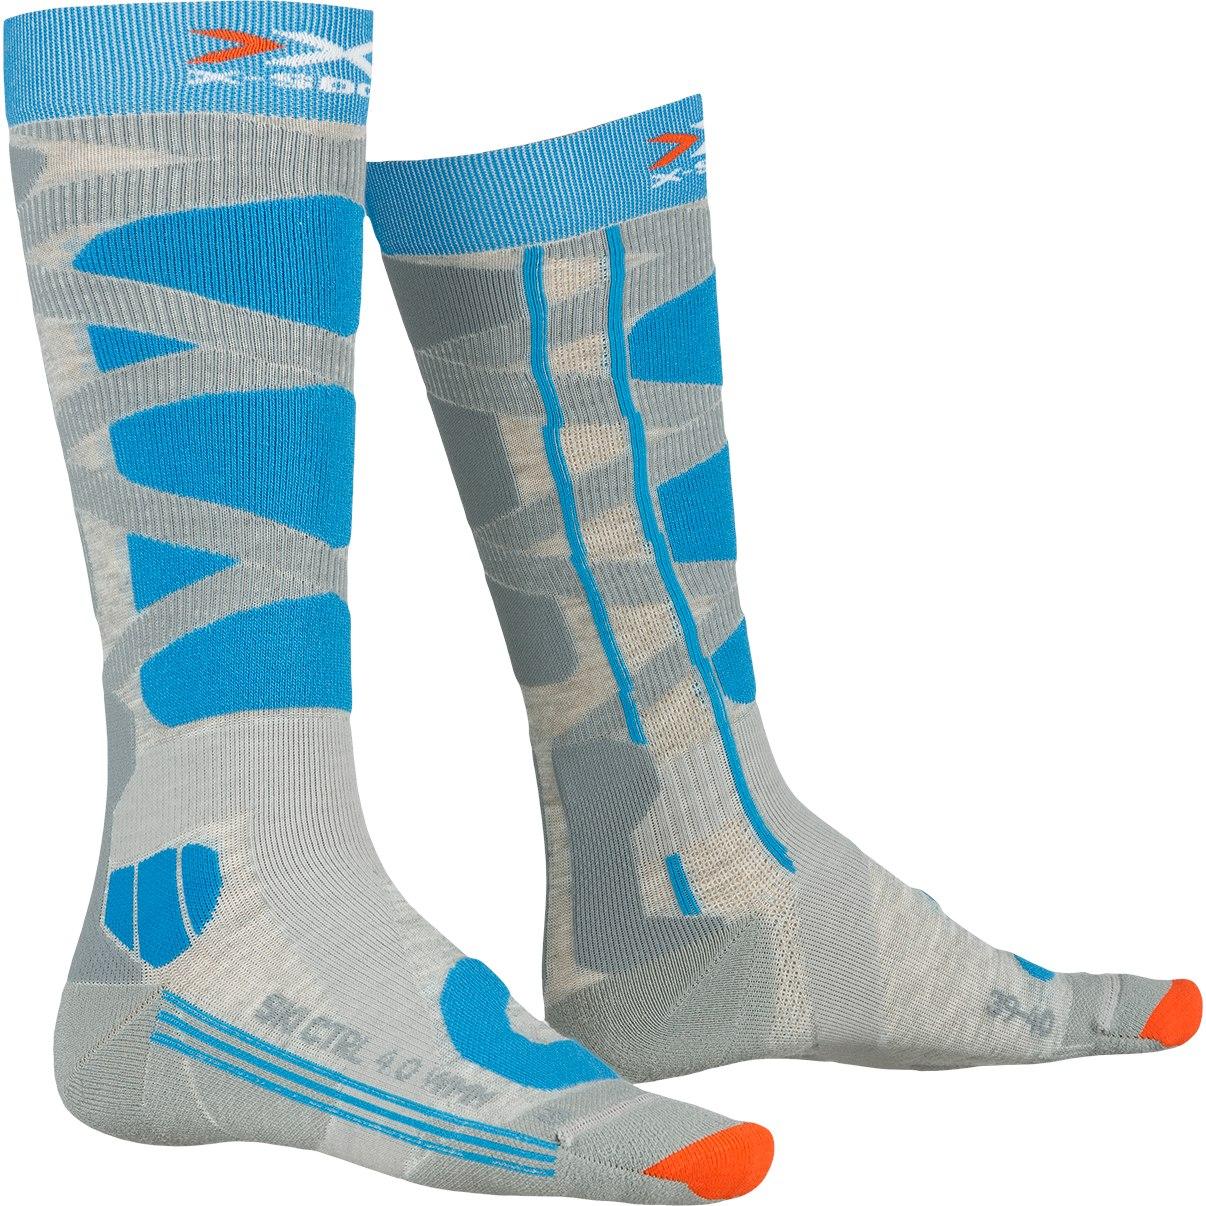 X-Socks Ski Control 4.0 Socken für Damen - grey melange/turquoise